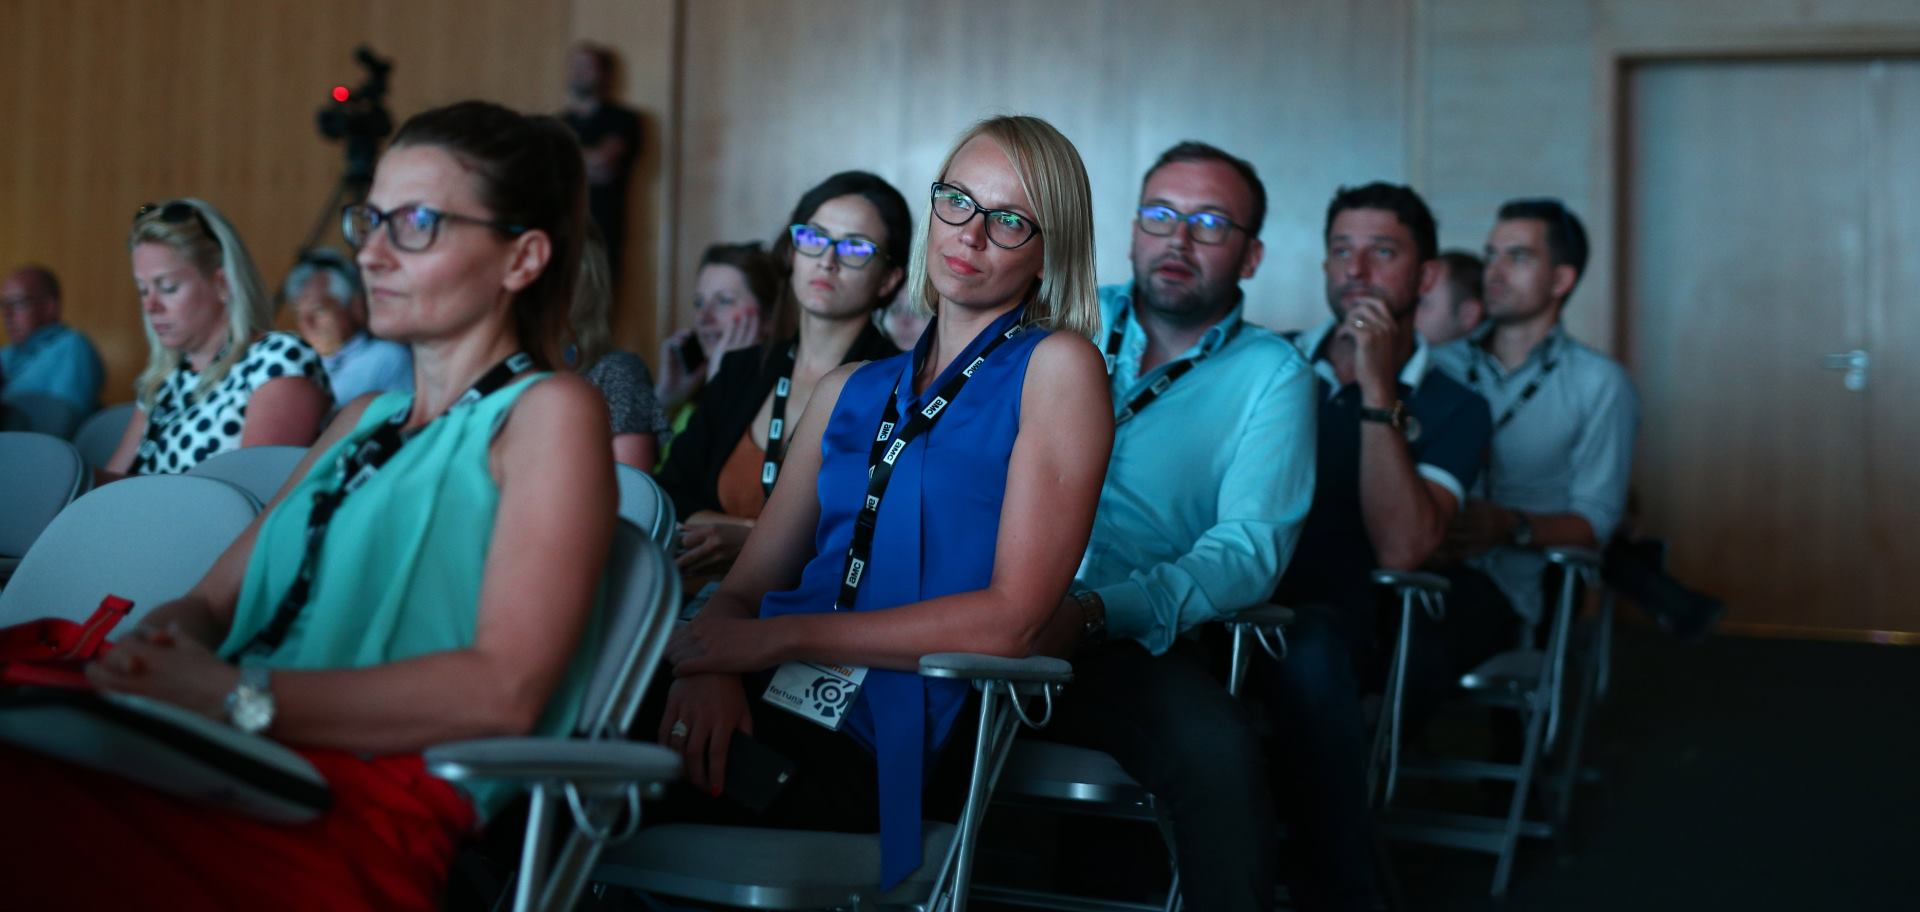 NEM 2018 Panel 'Mali šefovi – veliki zahtjevi' tiče se najmlađih konzumenata medijskog sadržaja